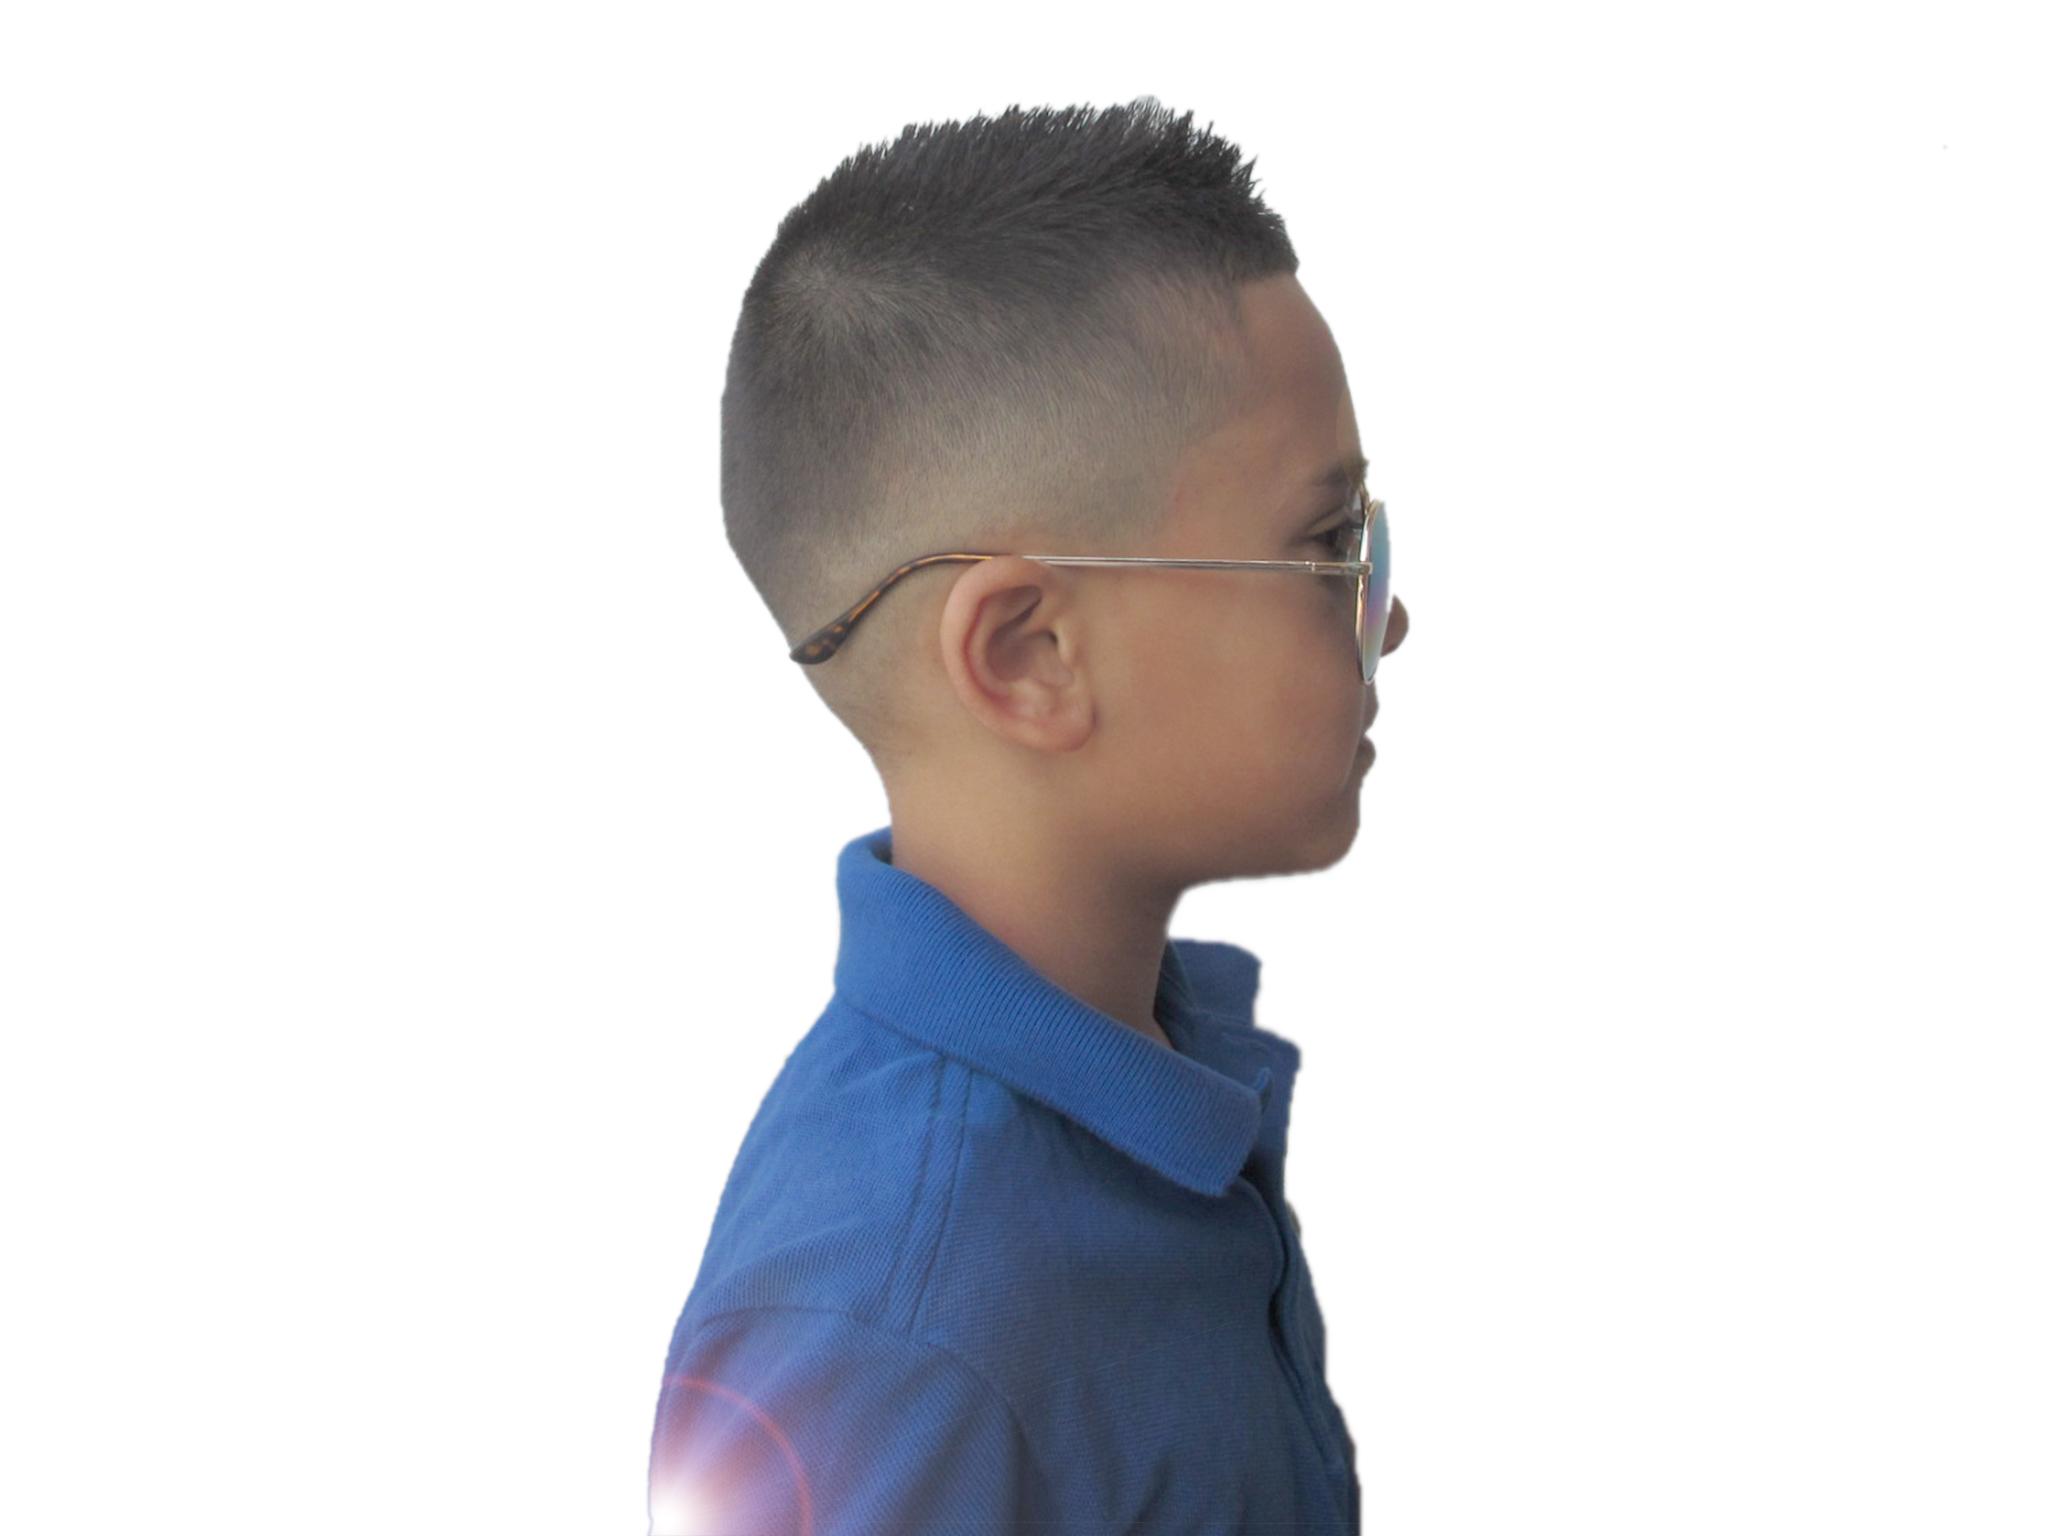 khaxai kids cut side fade